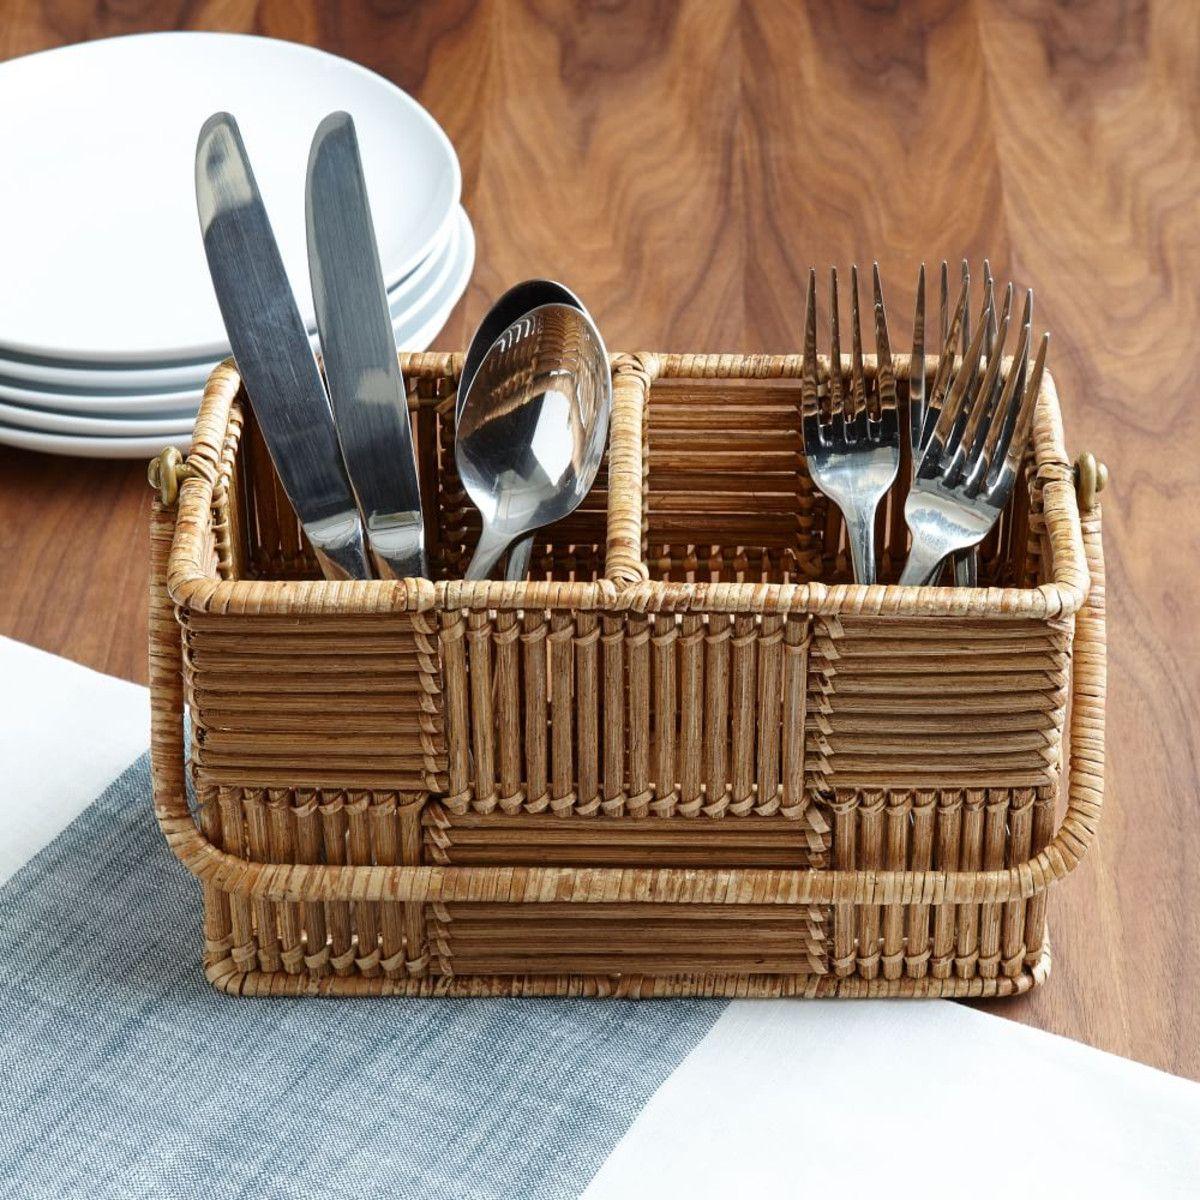 woven rattan caddy kitchen rattan rattan furniture round tray rh pinterest ch